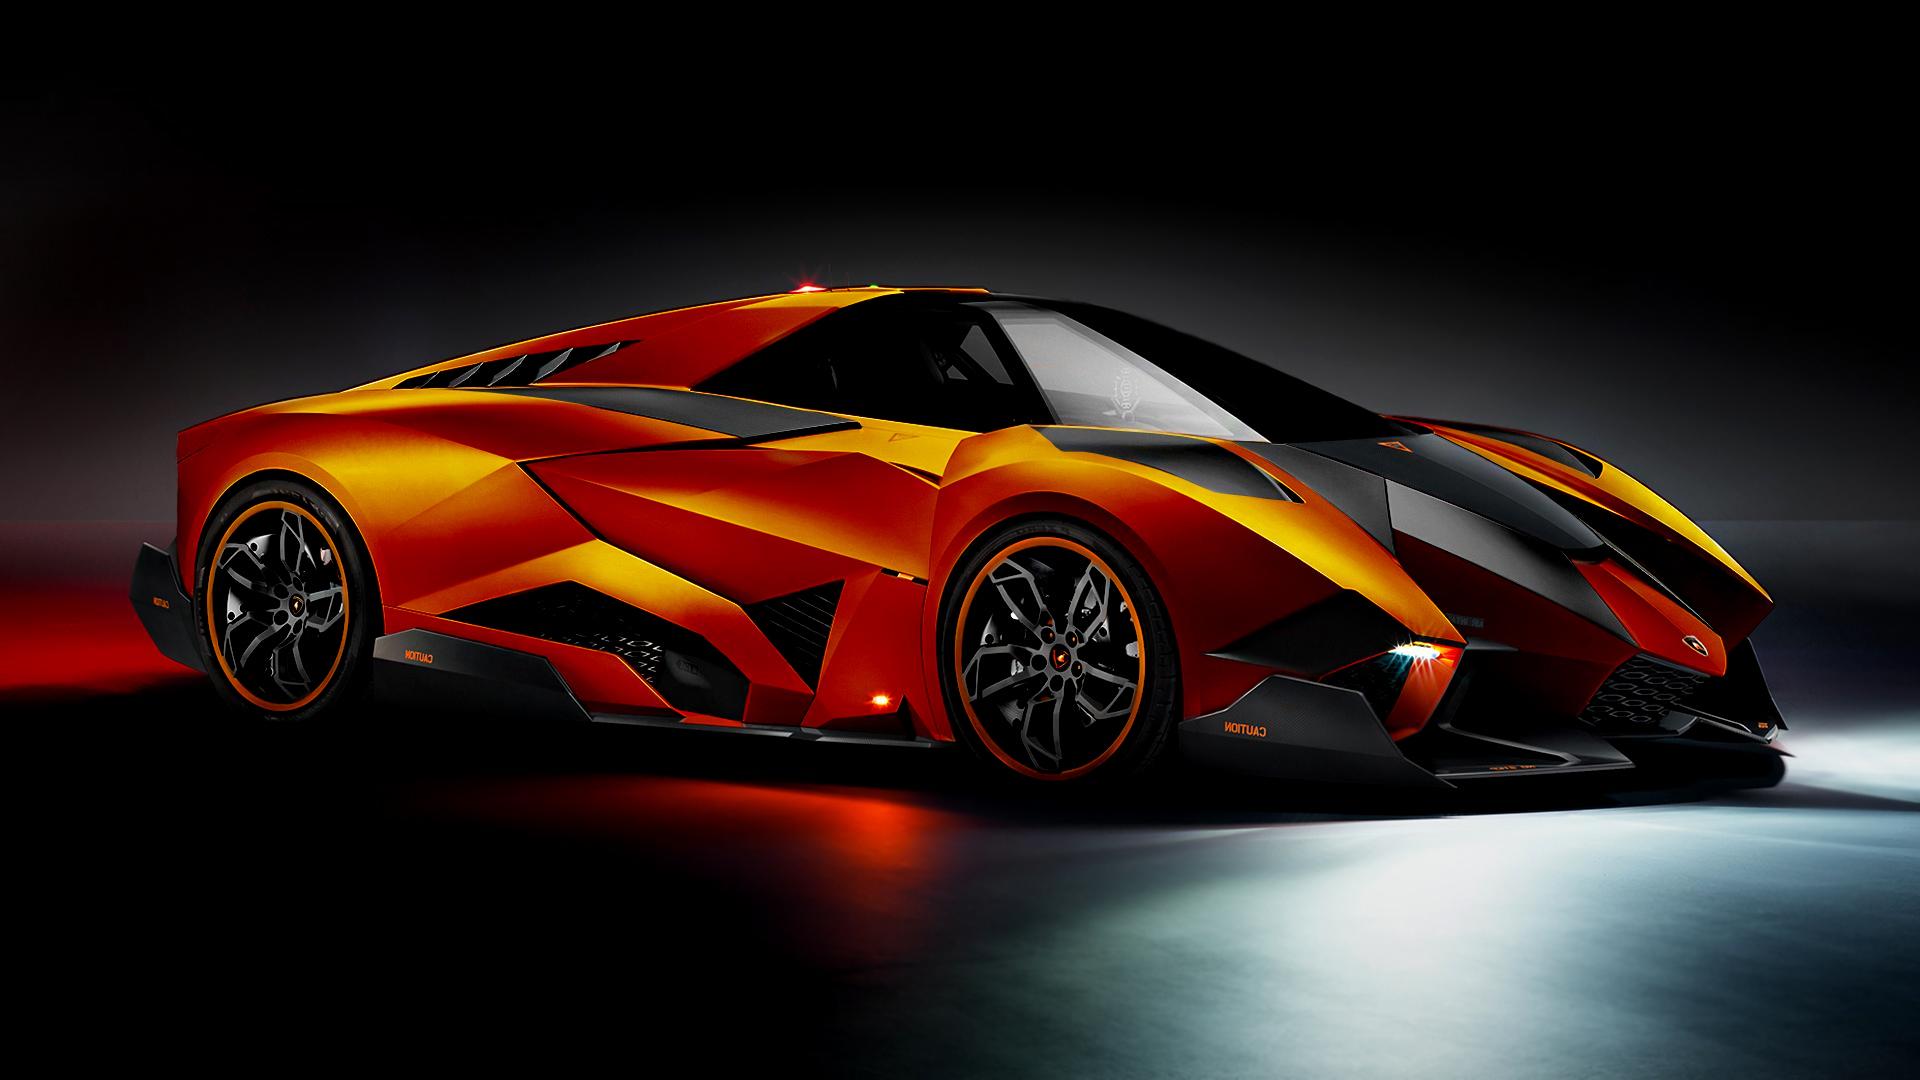 Lamborghini Egoista HD Wallpaper | Background Image ...